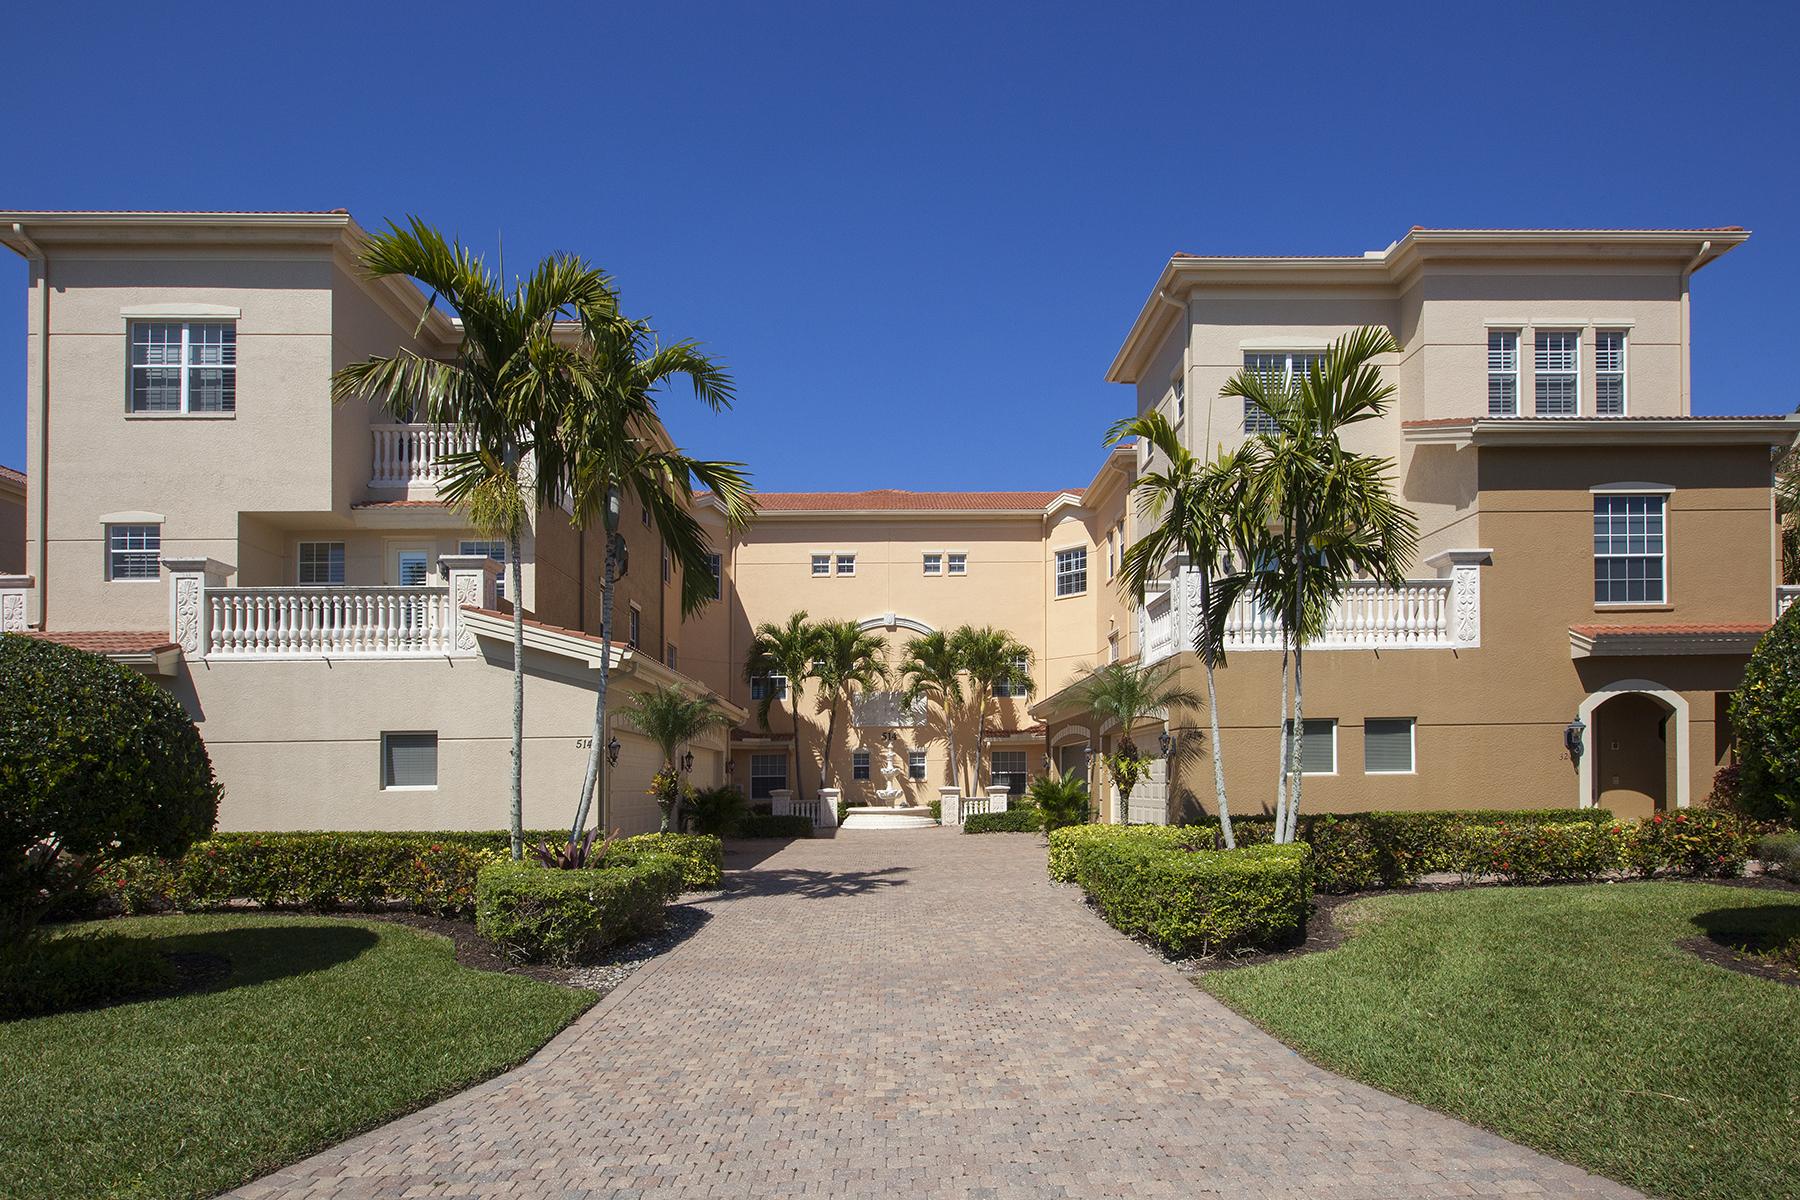 sales property at 514 Avellino Isles Cir , 3302, Naples, FL 34119